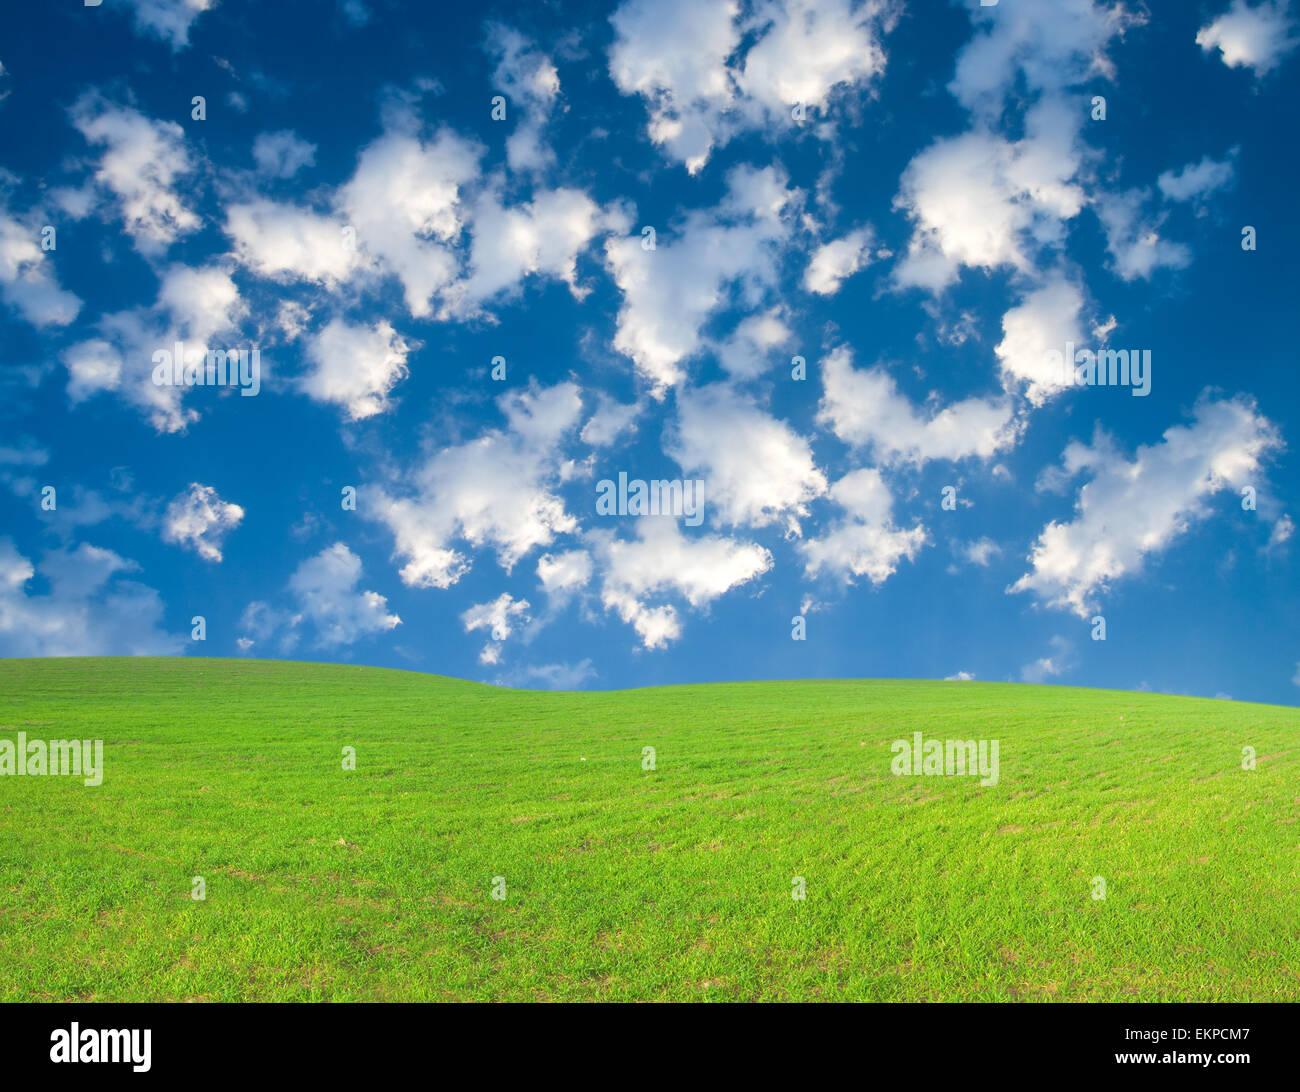 Green Fields Blue Sky White Clouds Stock Photos & Green Fields Blue